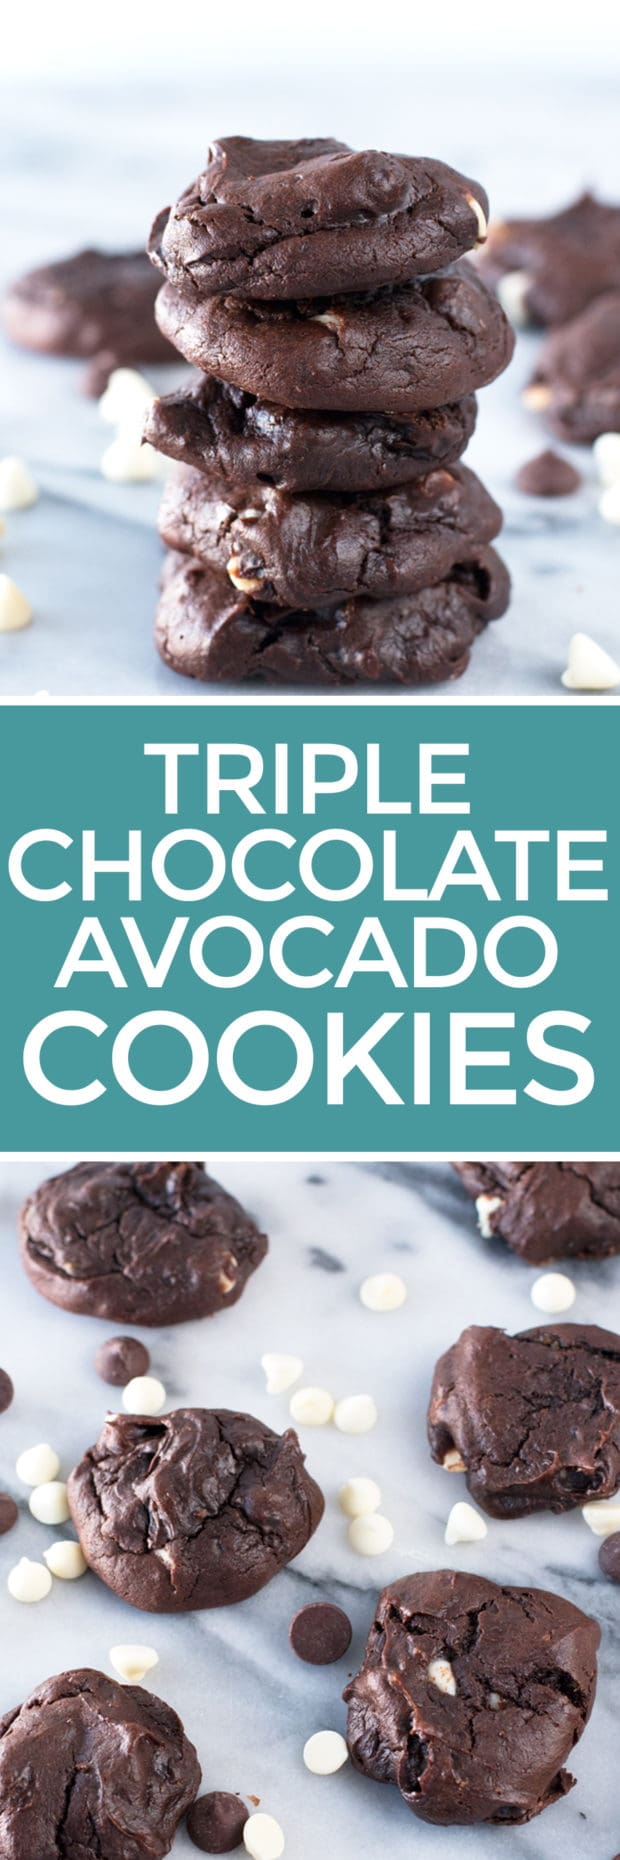 Triple Chocolate Avocado Cookies | cakenknife.com